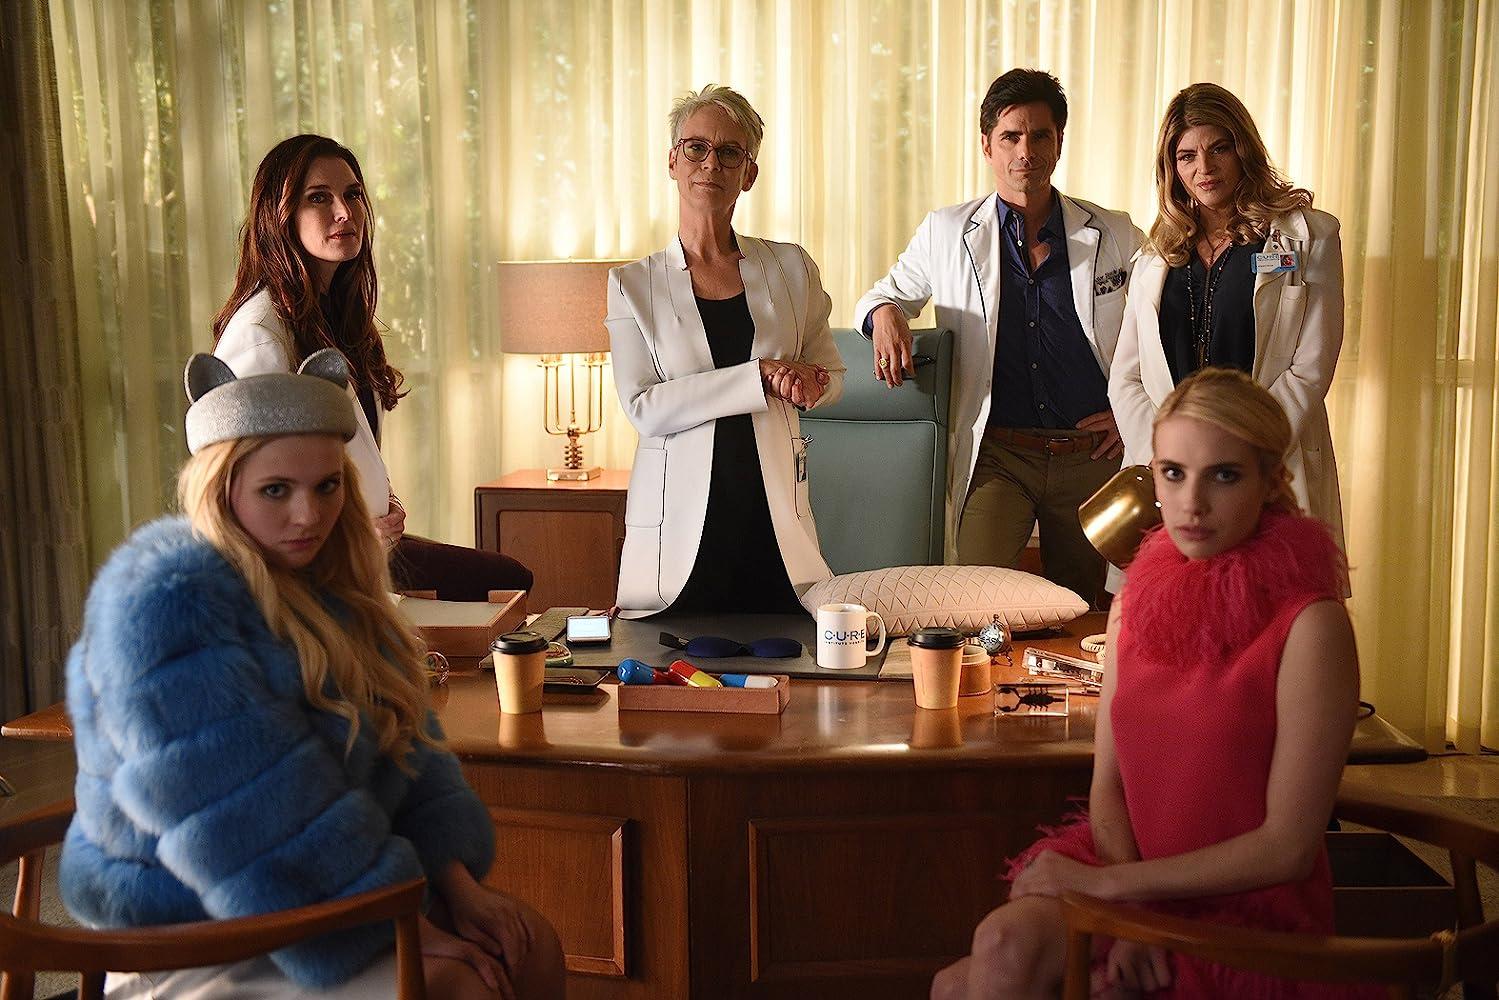 Jamie Lee Curtis, Brooke Shields, Kirstie Alley, John Stamos, Emma Roberts, and Abigail Breslin in Scream Queens (2015)